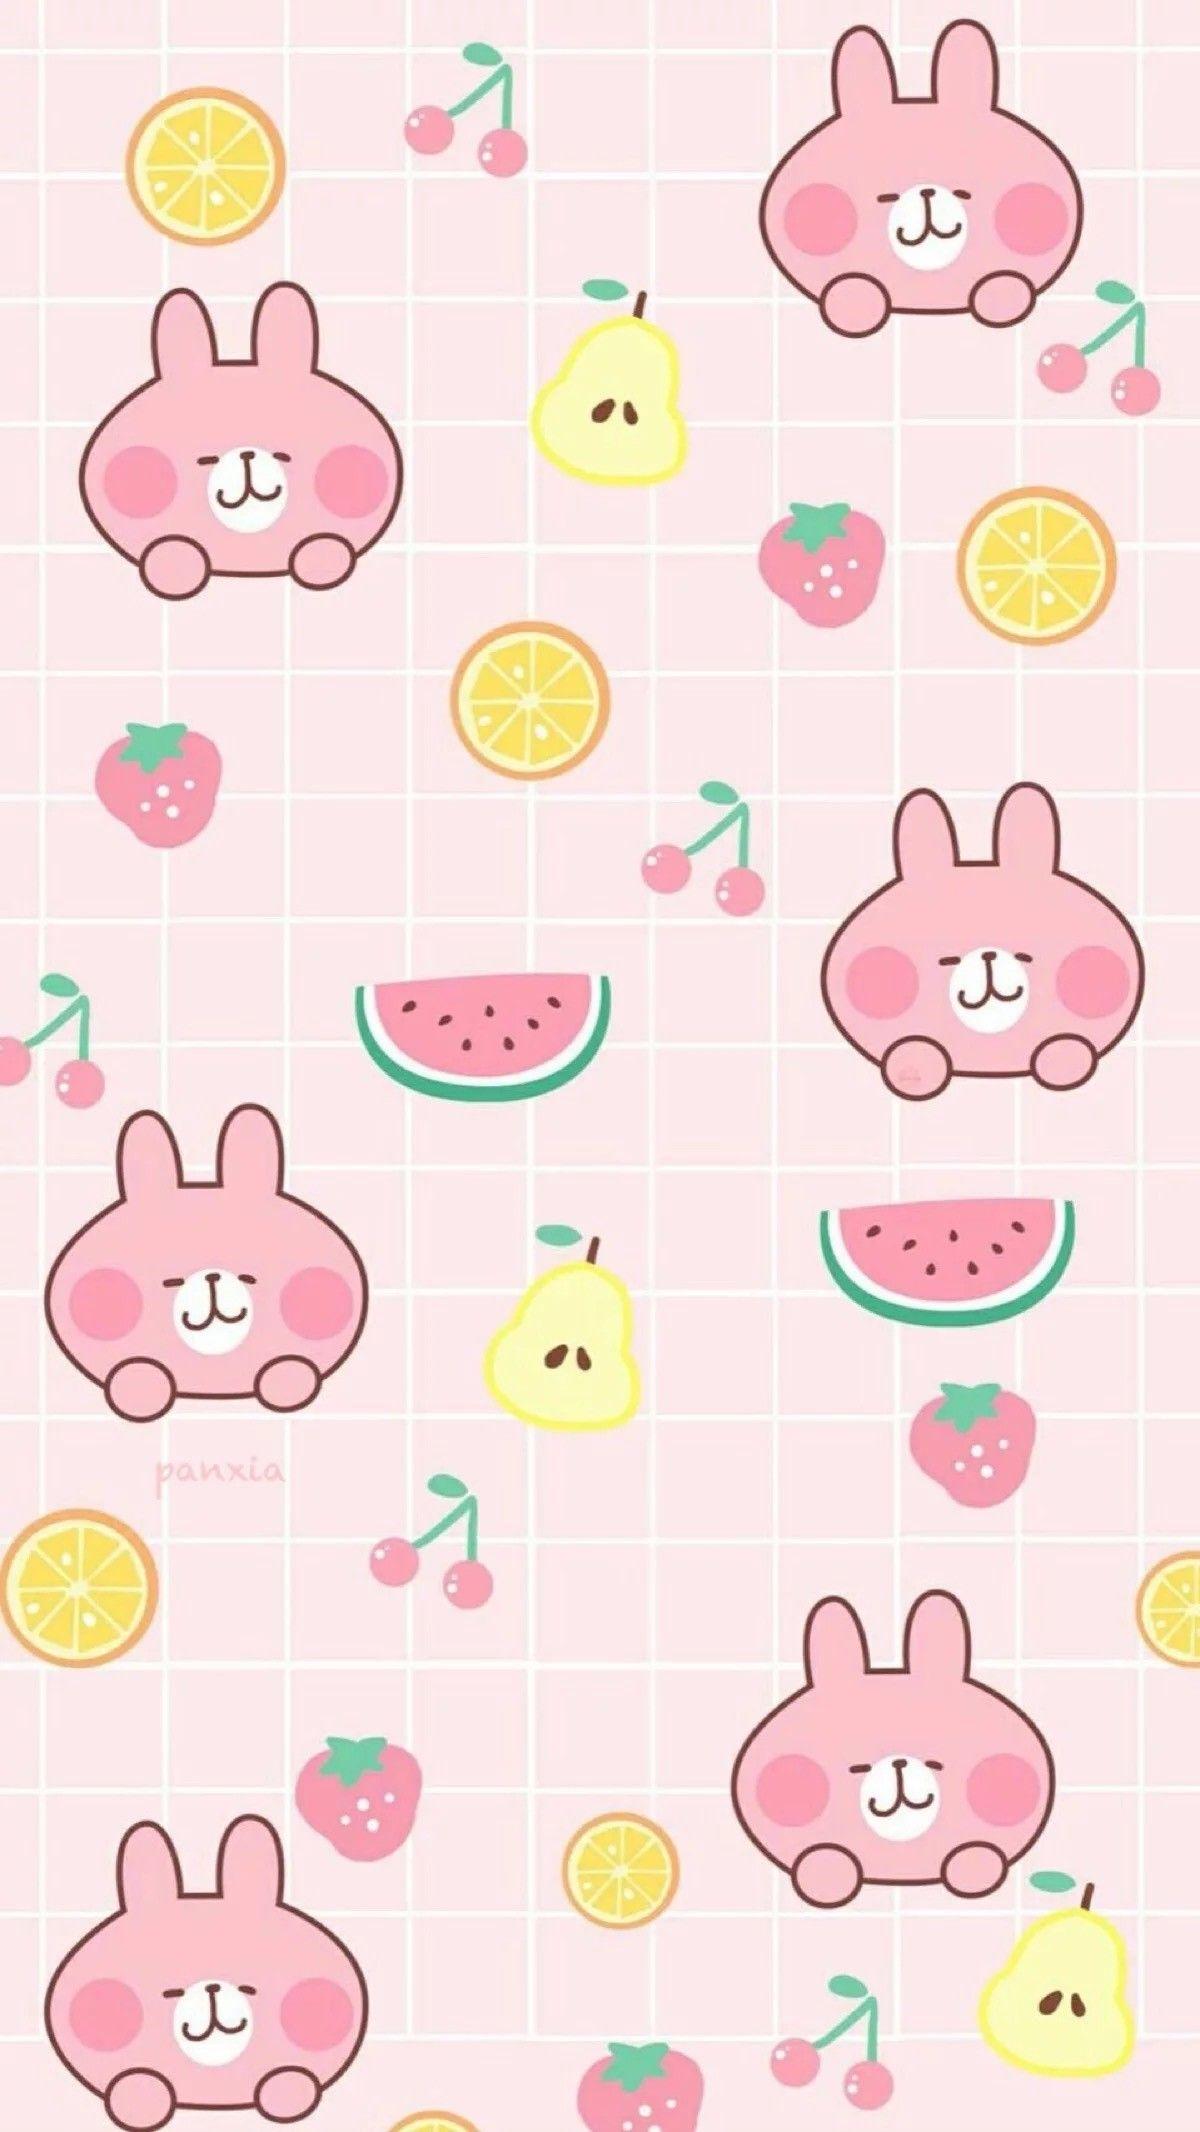 13 Of Unique Kawaii Phone Background 2k In 2020 Kawaii Wallpaper Iphone Background Iphone Wallpaper